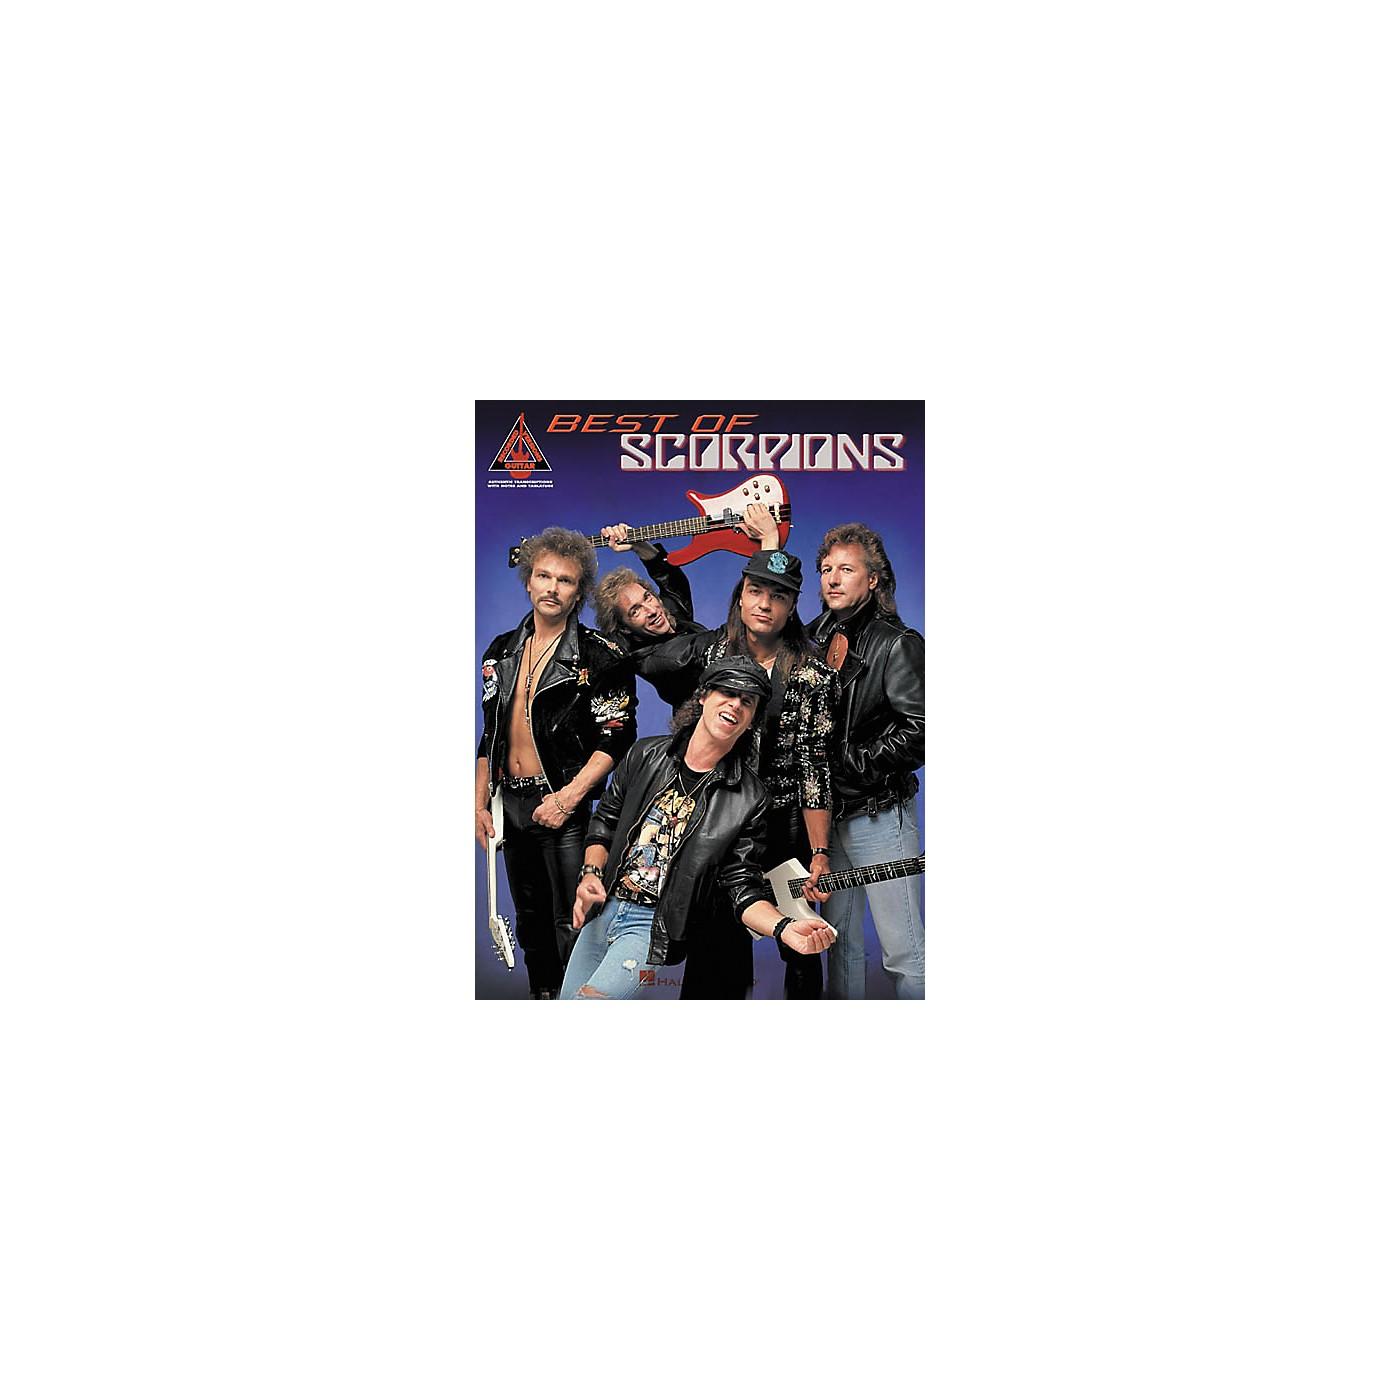 Hal Leonard Best of Scorpions Guitar Tab Songbook thumbnail